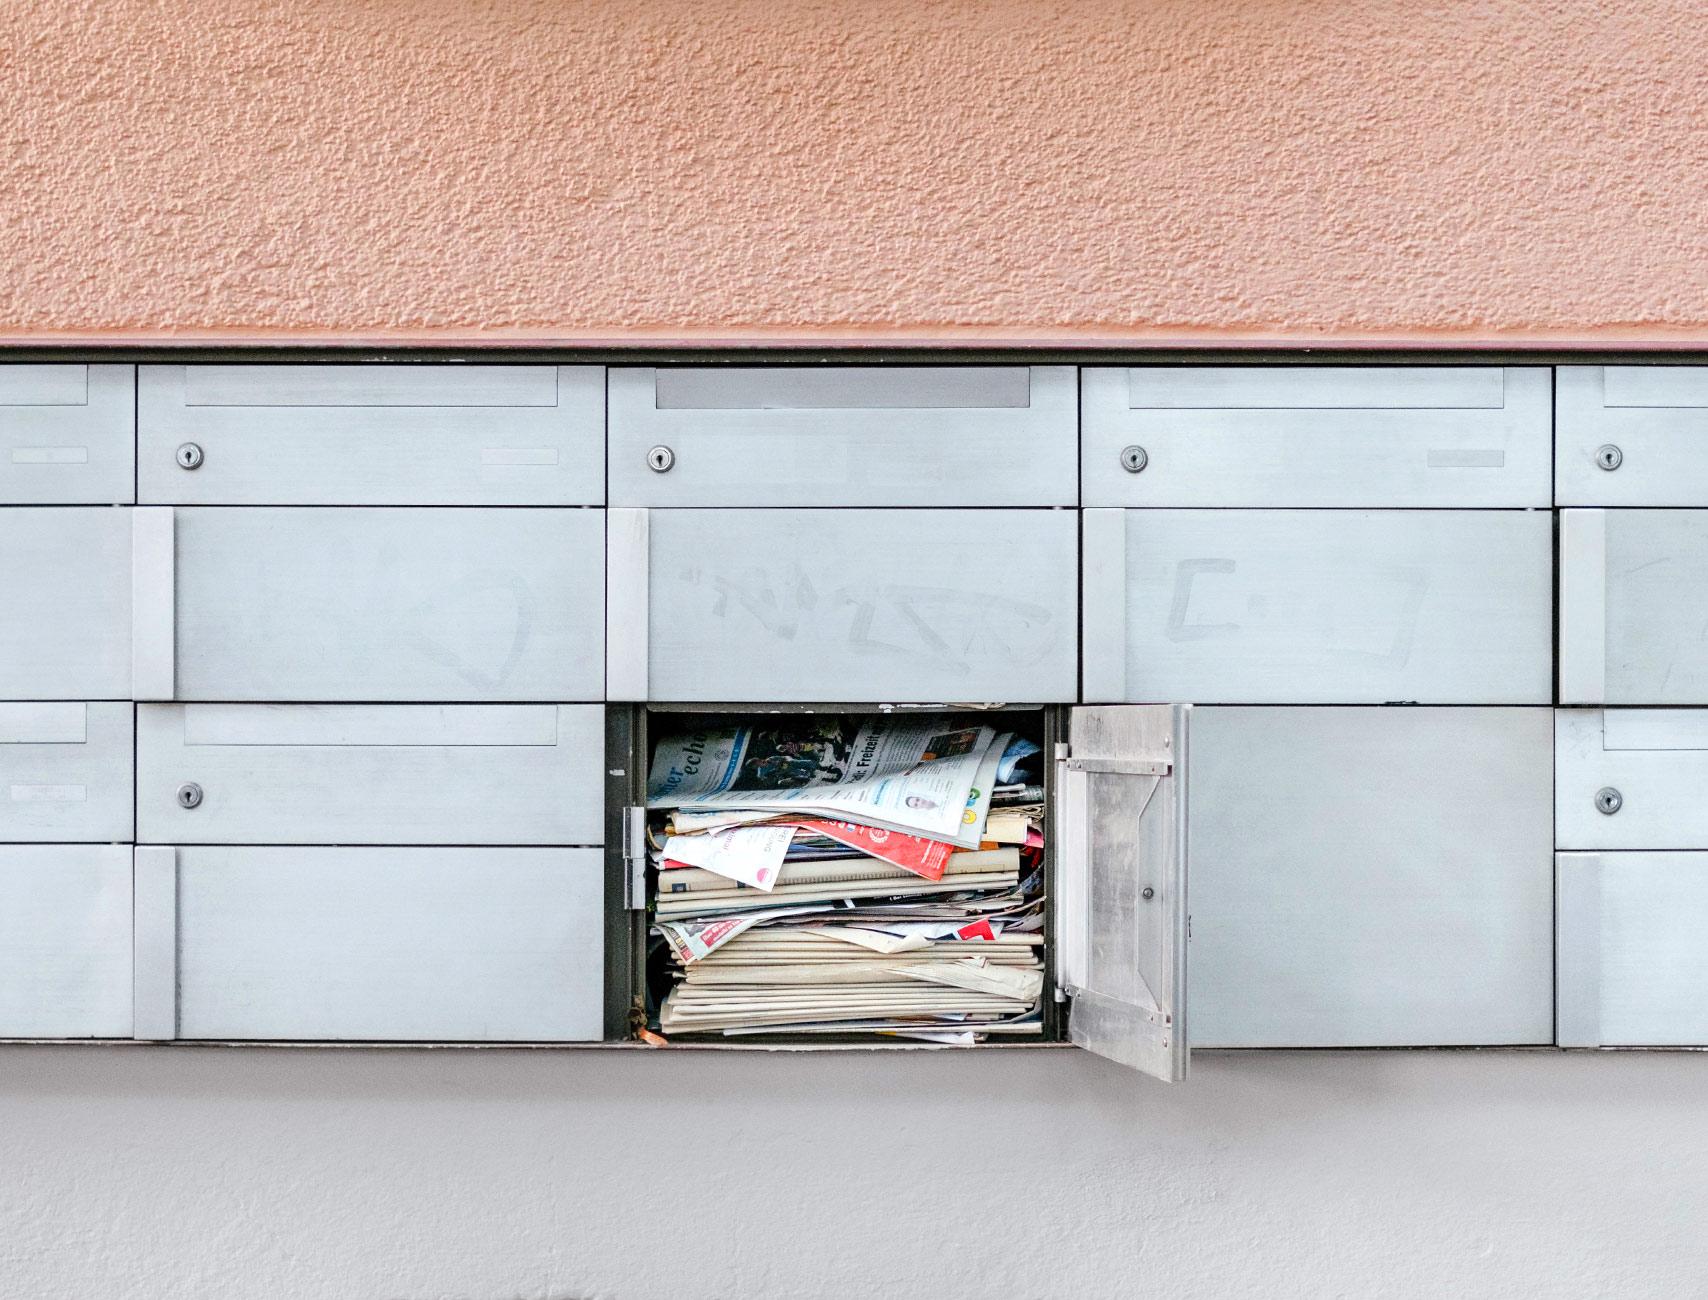 Transfert de courrier La Poste